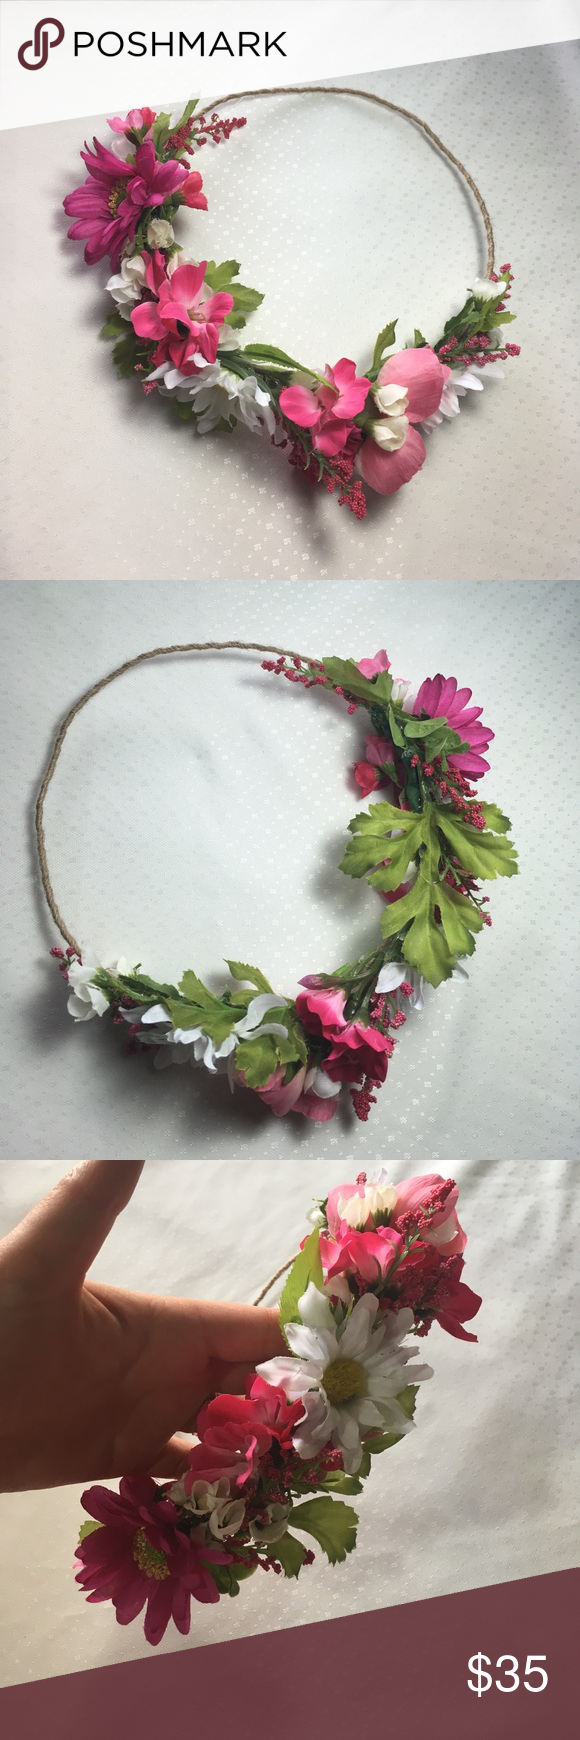 Flower Crown Festival Wedding Bohemian Pink White Gorgeous Handmade